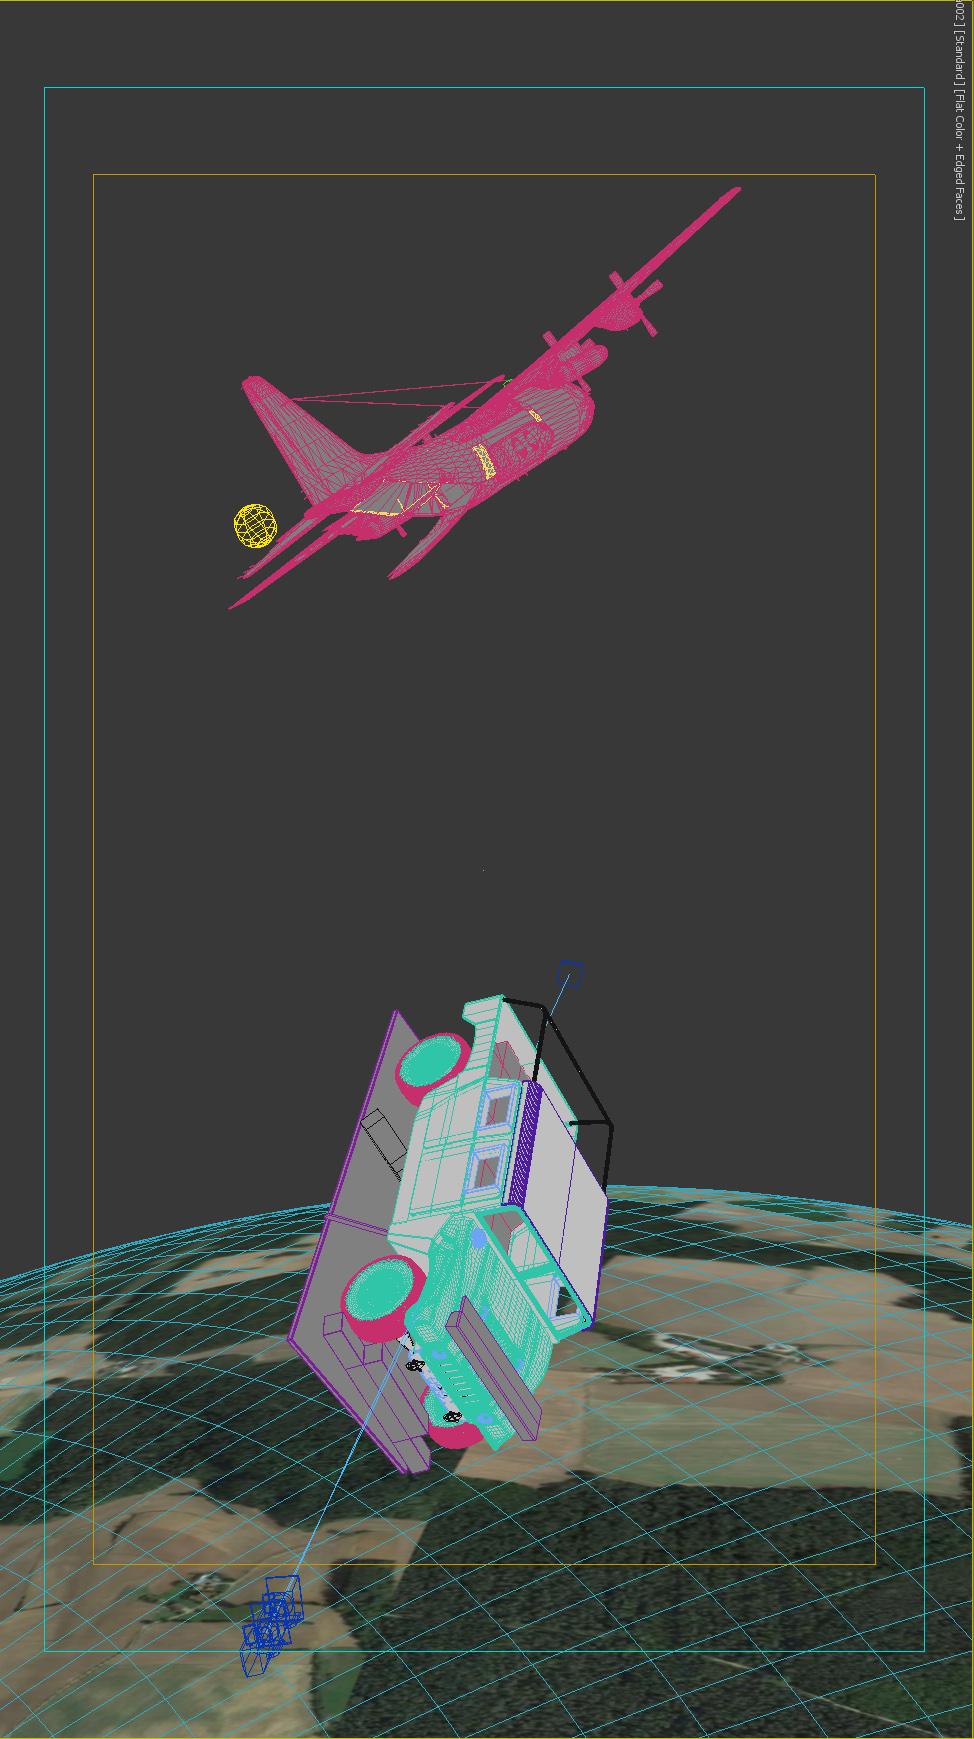 landing HMMWV